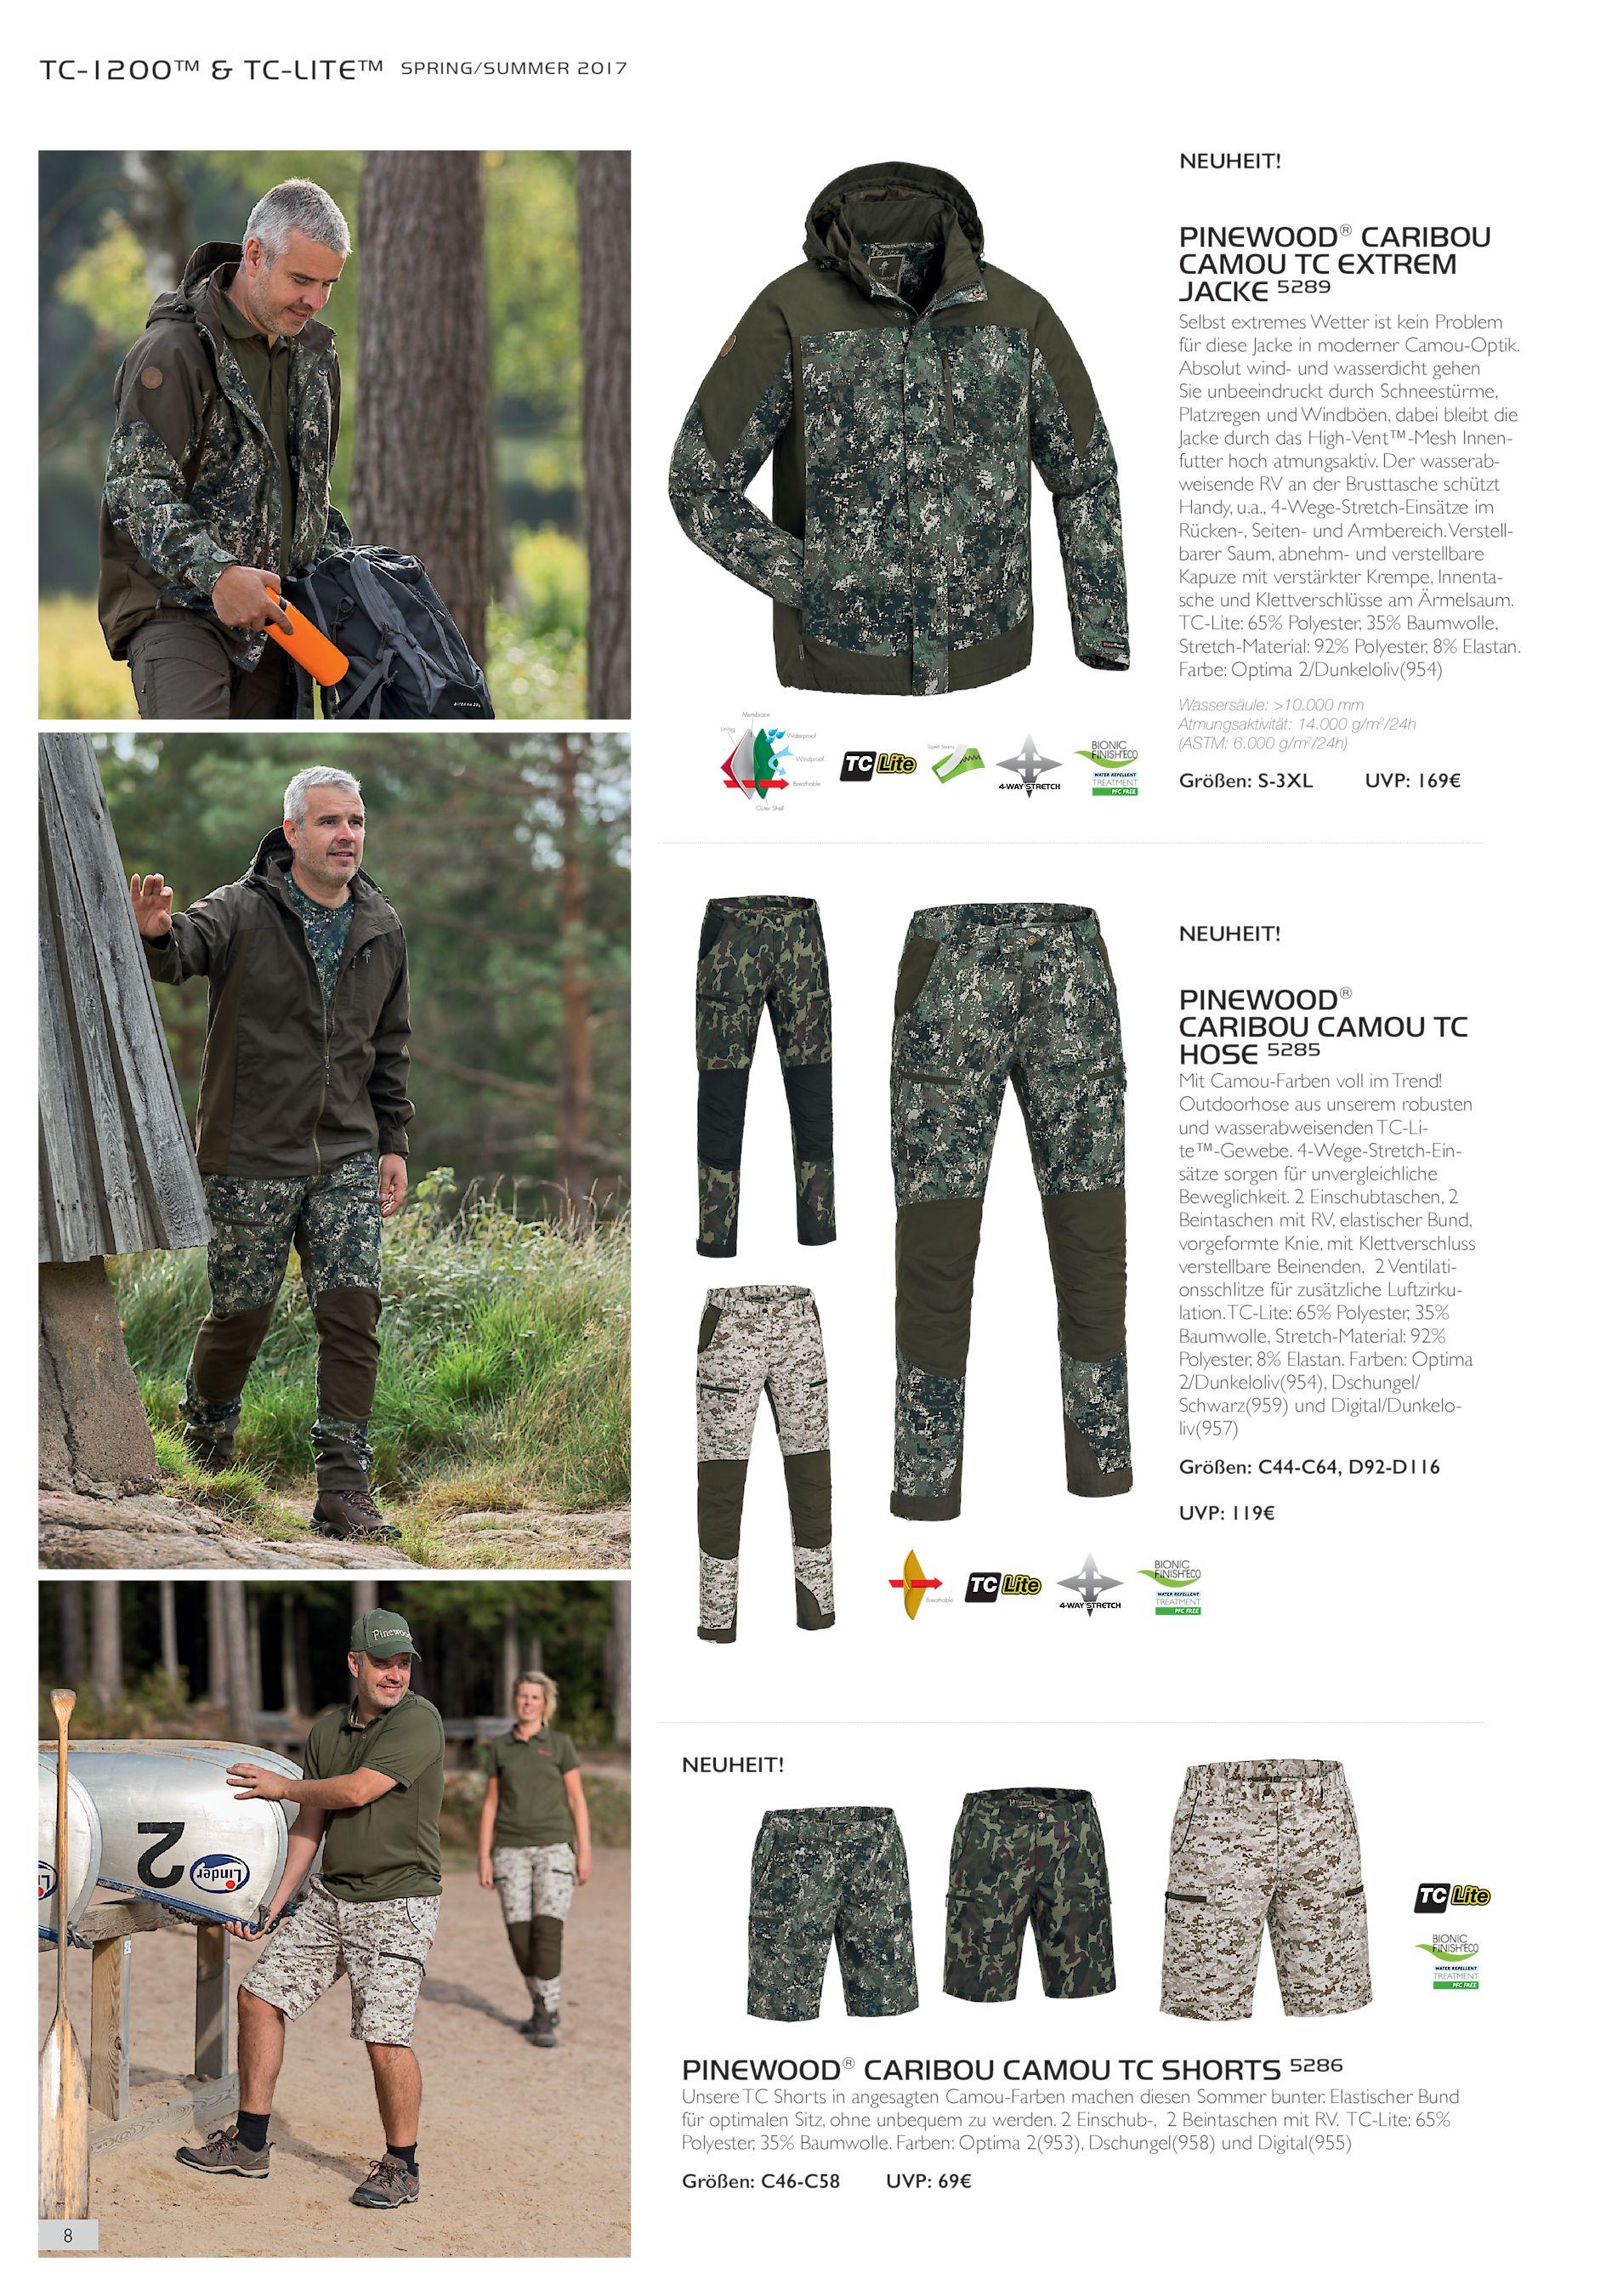 52 Outdoorhose wasserabweisend Pinewood Caribou Camou Digital TC-Lite Hose Gr